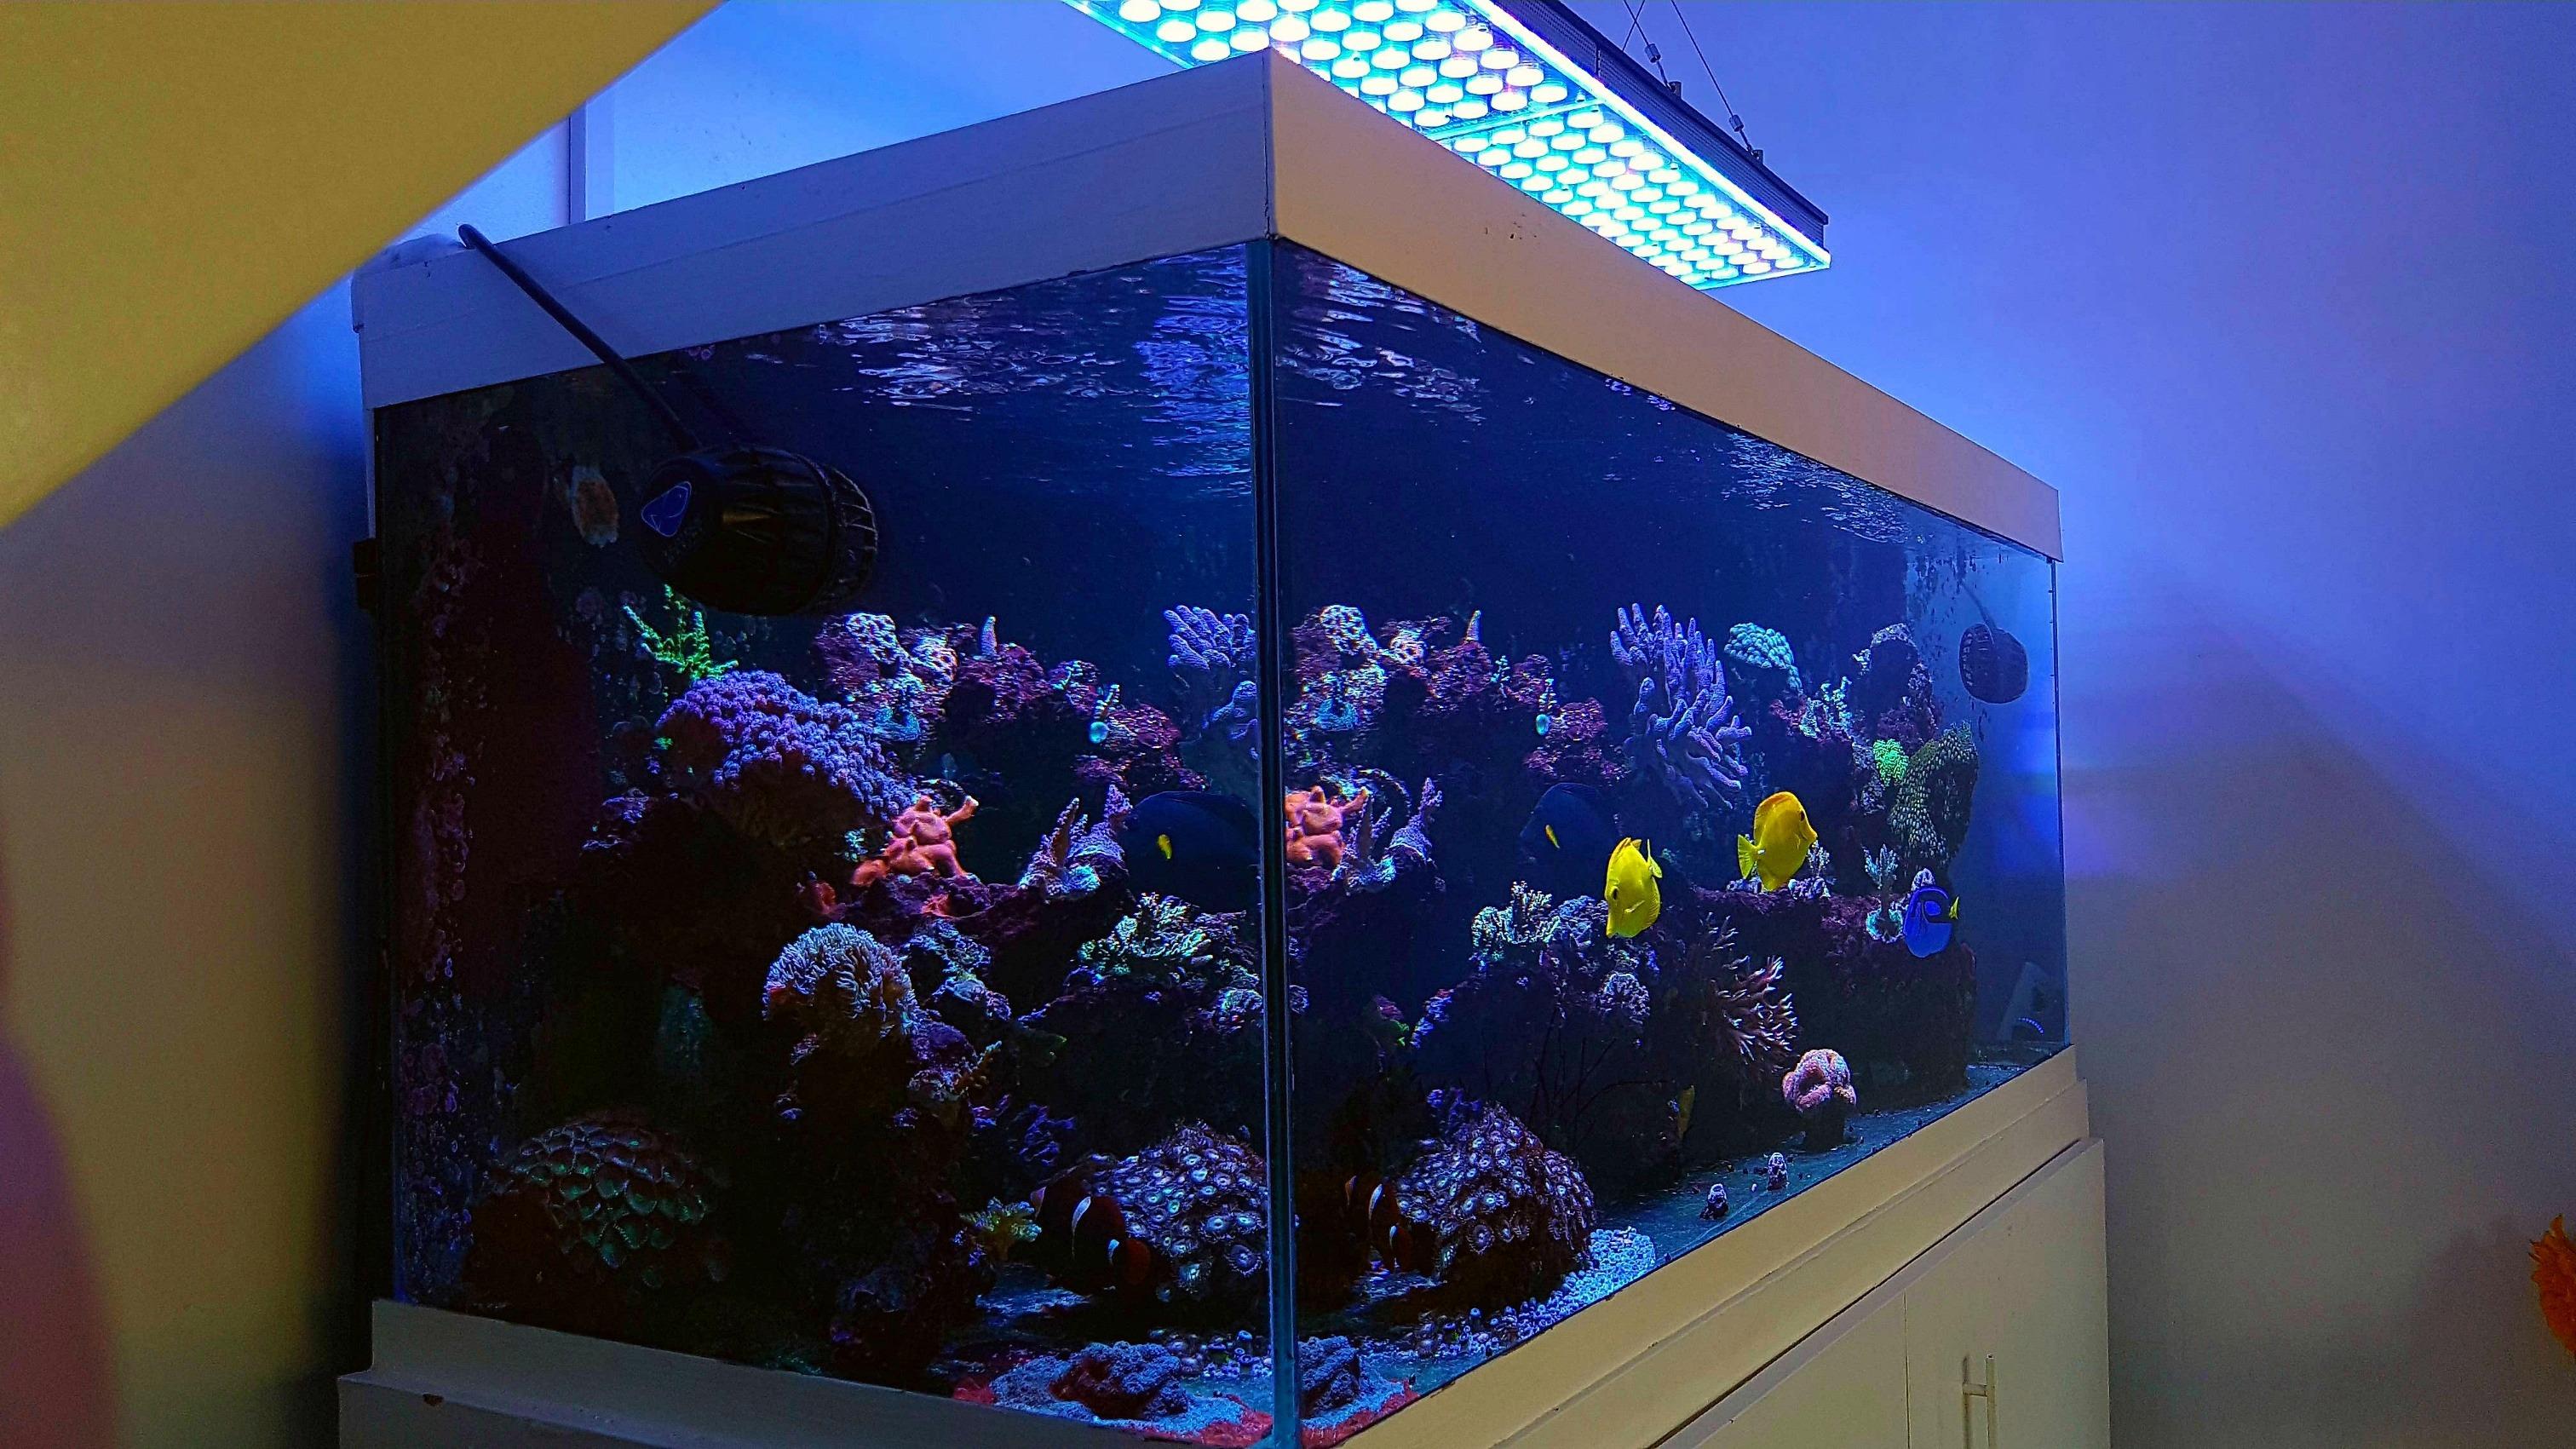 Aquarium Led Beleuchtung Erfahrung | Uk Kundenbesprechung Atlantik V4 Reef Aquarium Led Beleuchtung